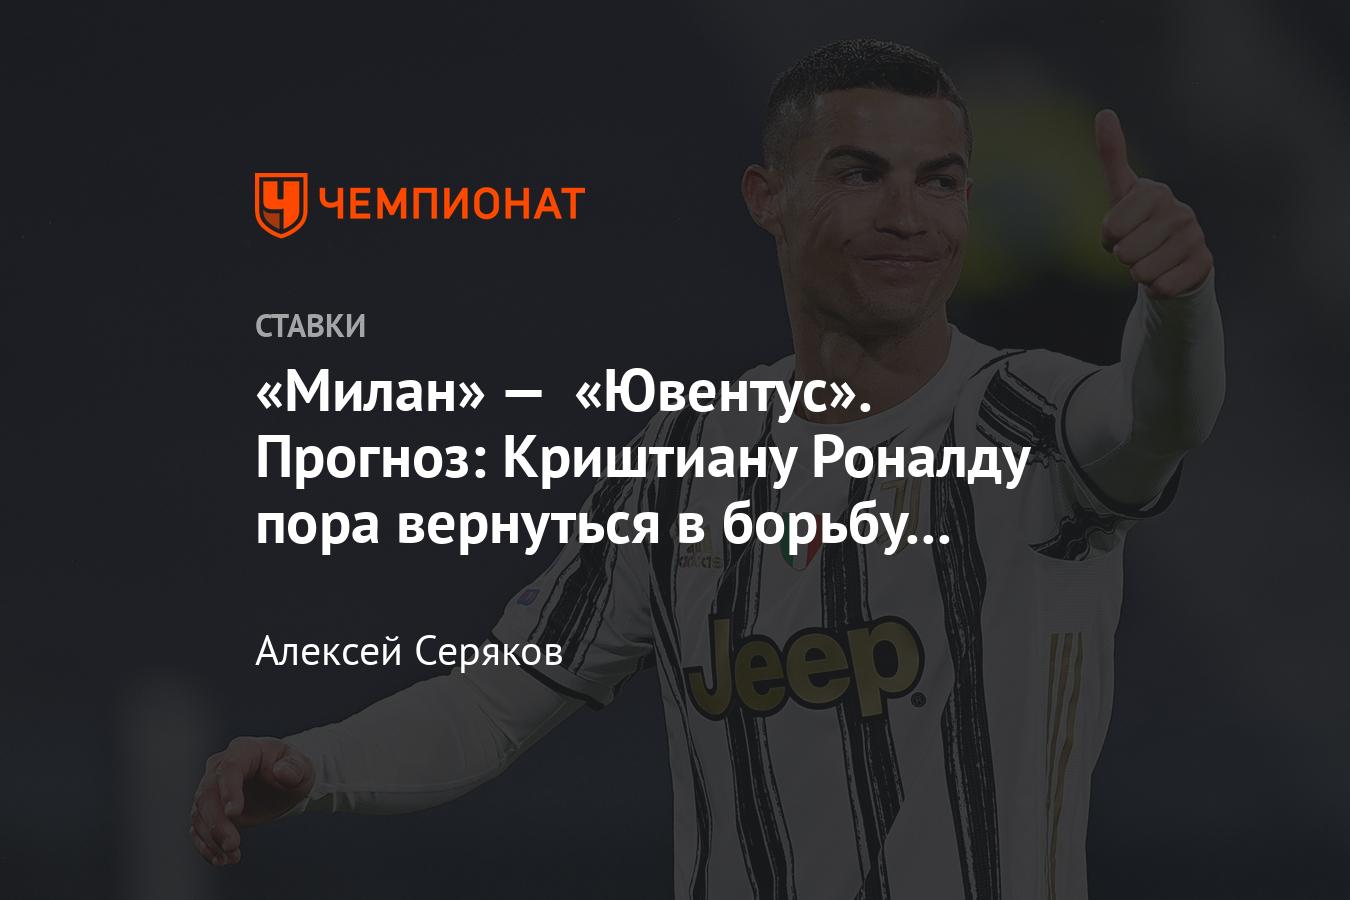 «Милан» — «Ювентус», 6 января 2021 года, прогноз и ставка ...